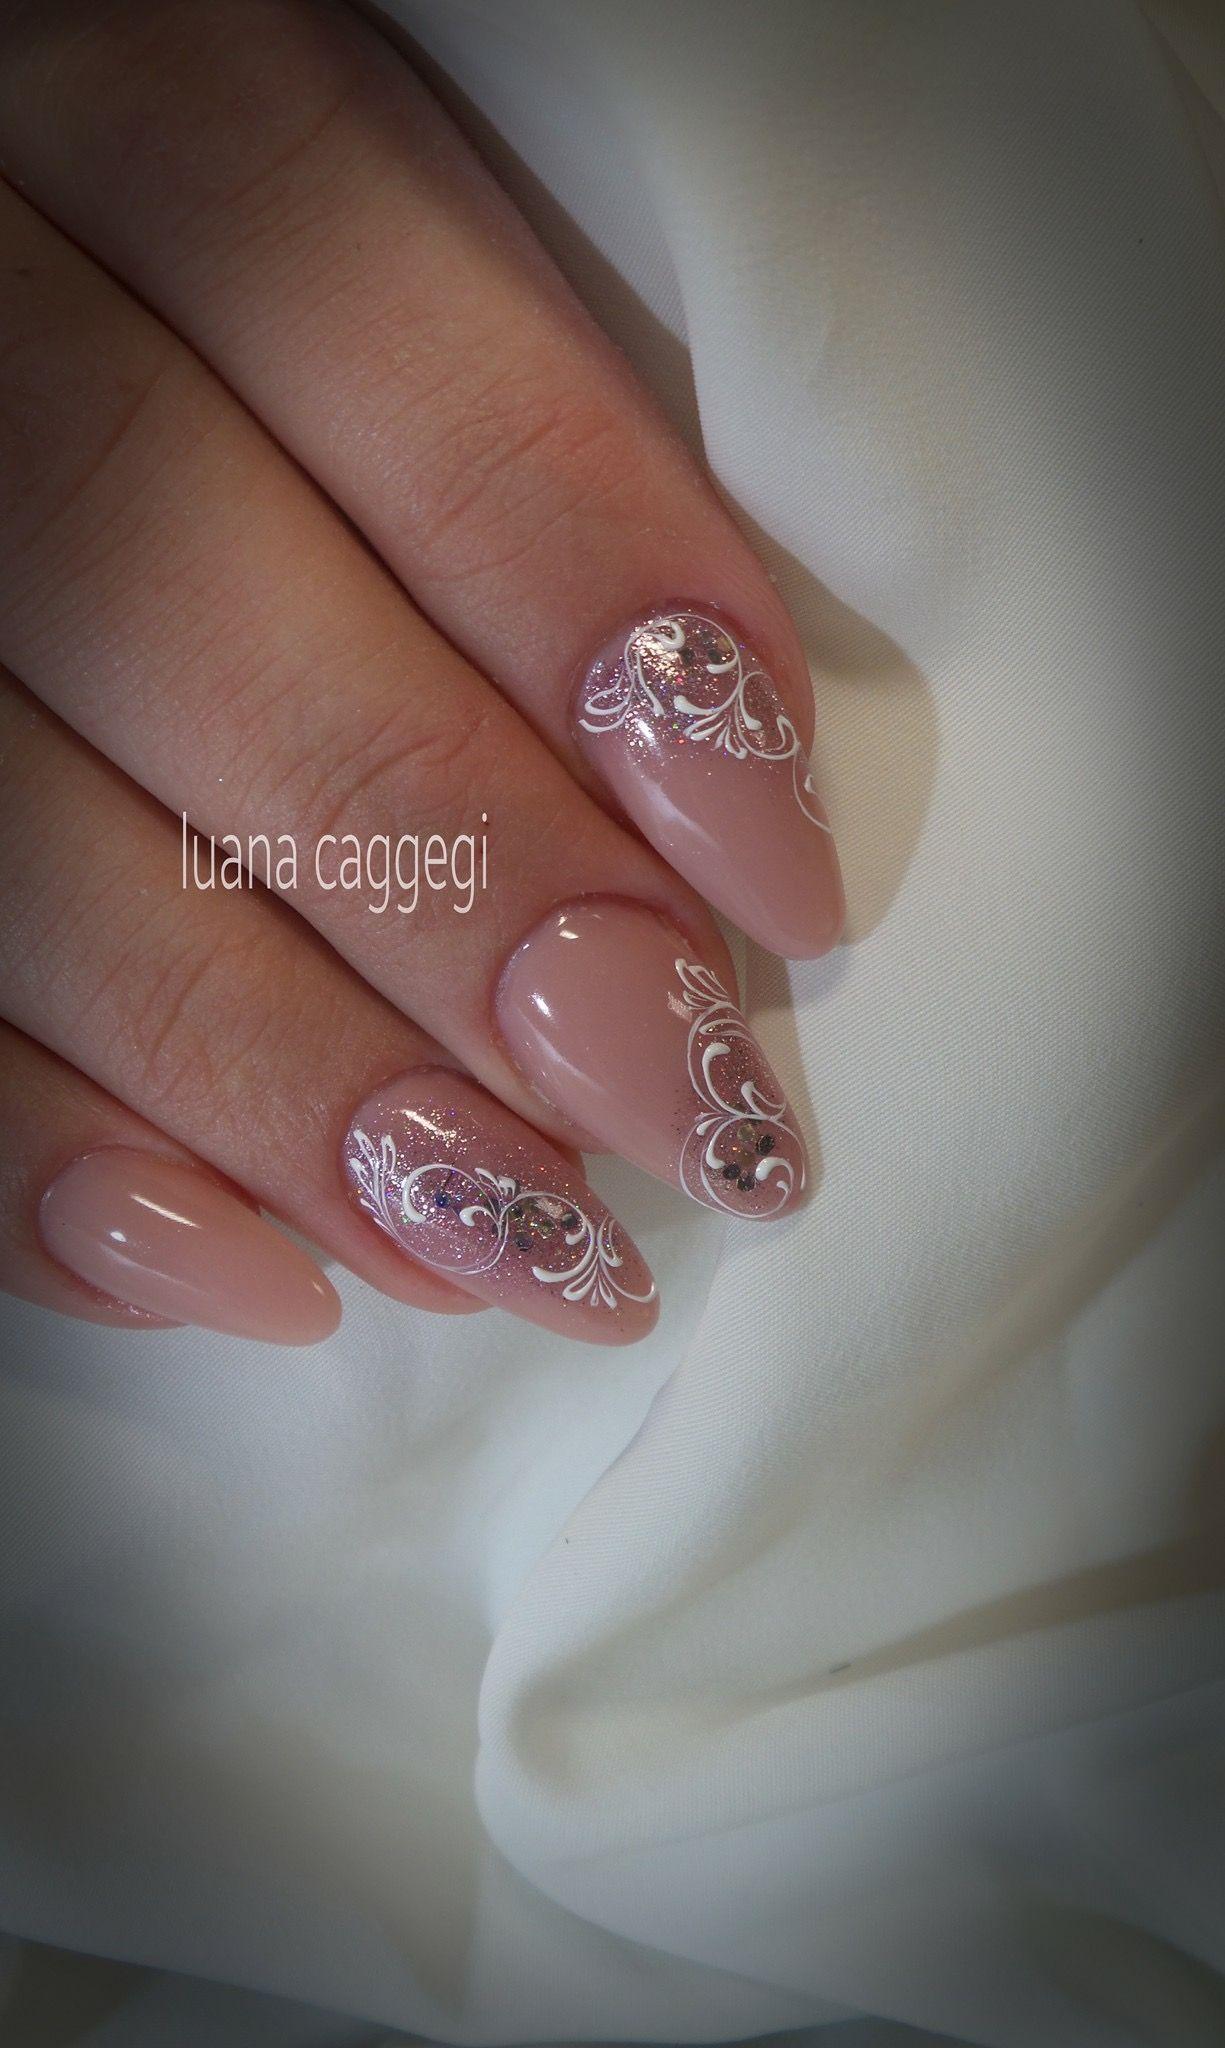 Pelikh Ideas Nails Pelikh Ideas Nails Ideas Nails Pelikh In 2020 Lace Nails Pink Nails Nail Art Wedding